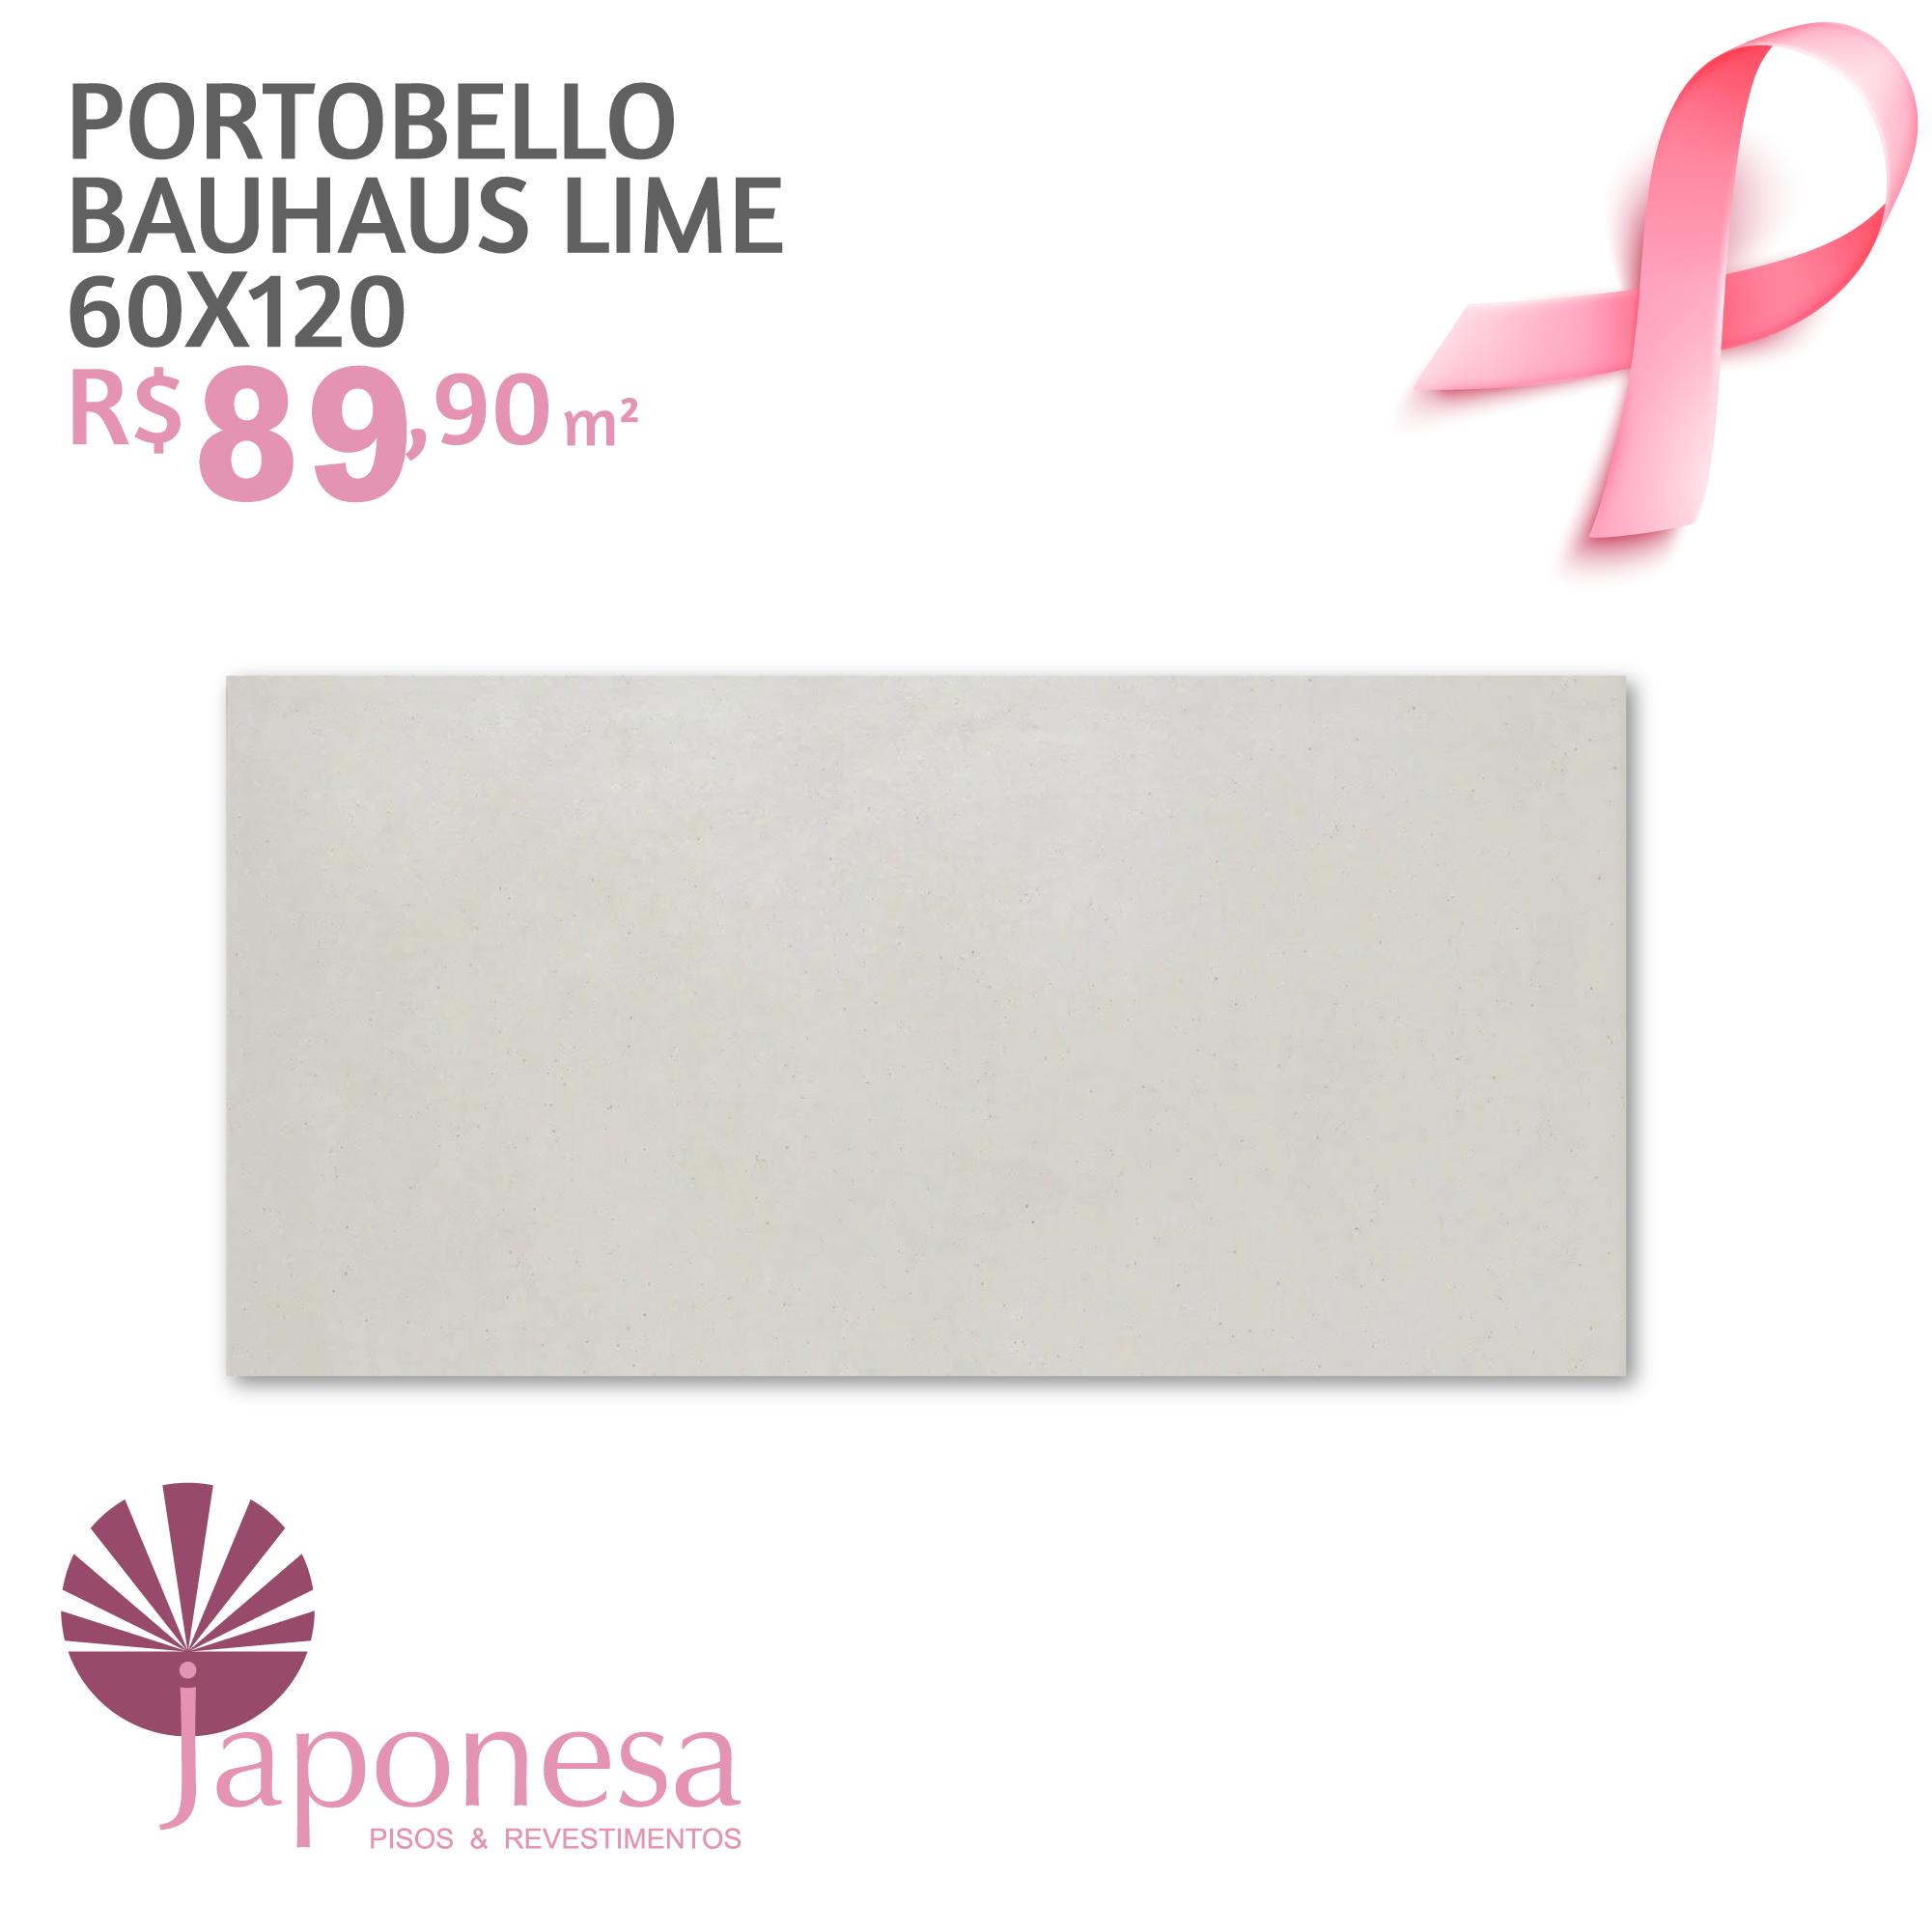 Portobello Bauhaus Lime 60×120